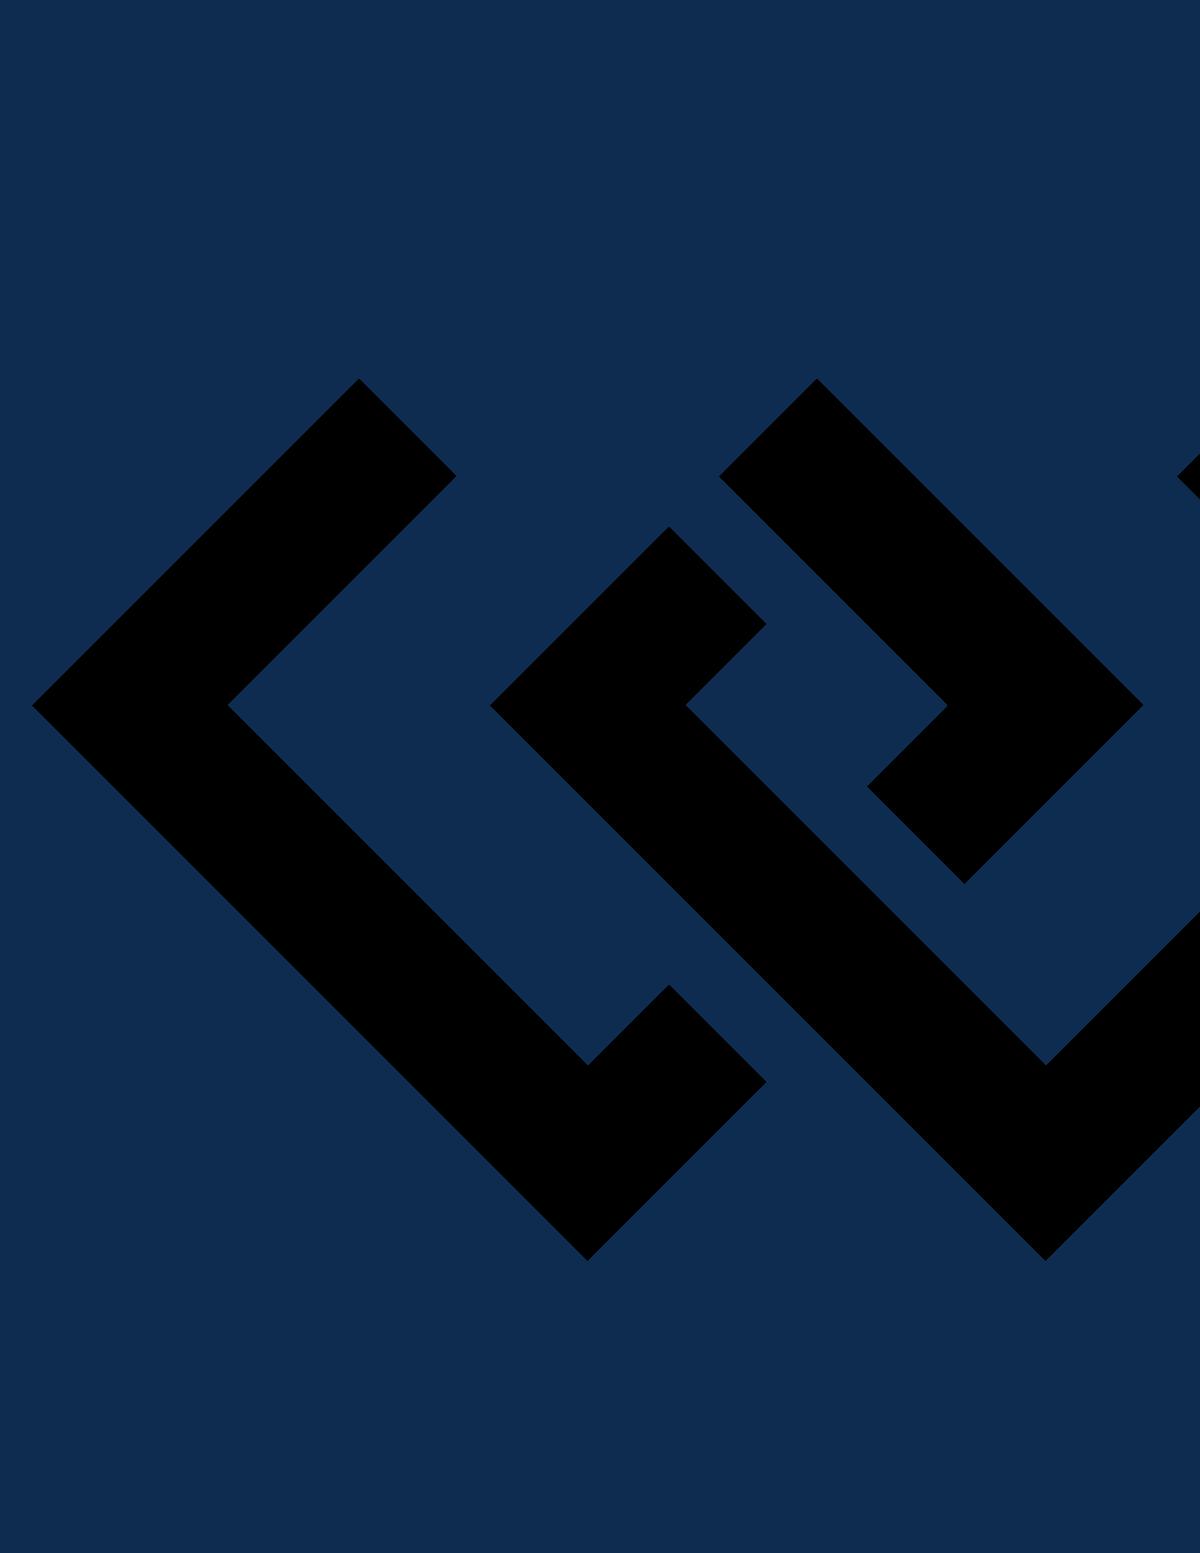 w-logo-clip